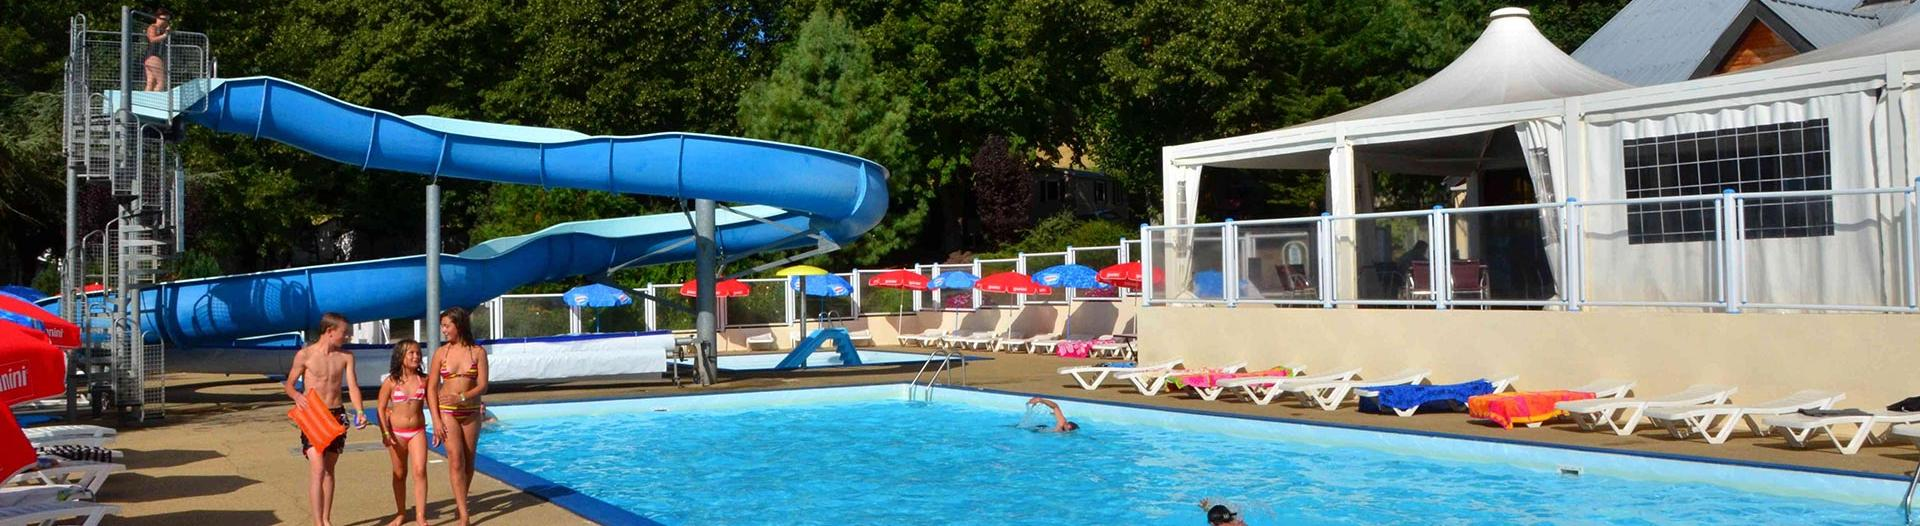 slider-camping-europe-murol-piscine-et-toboggan